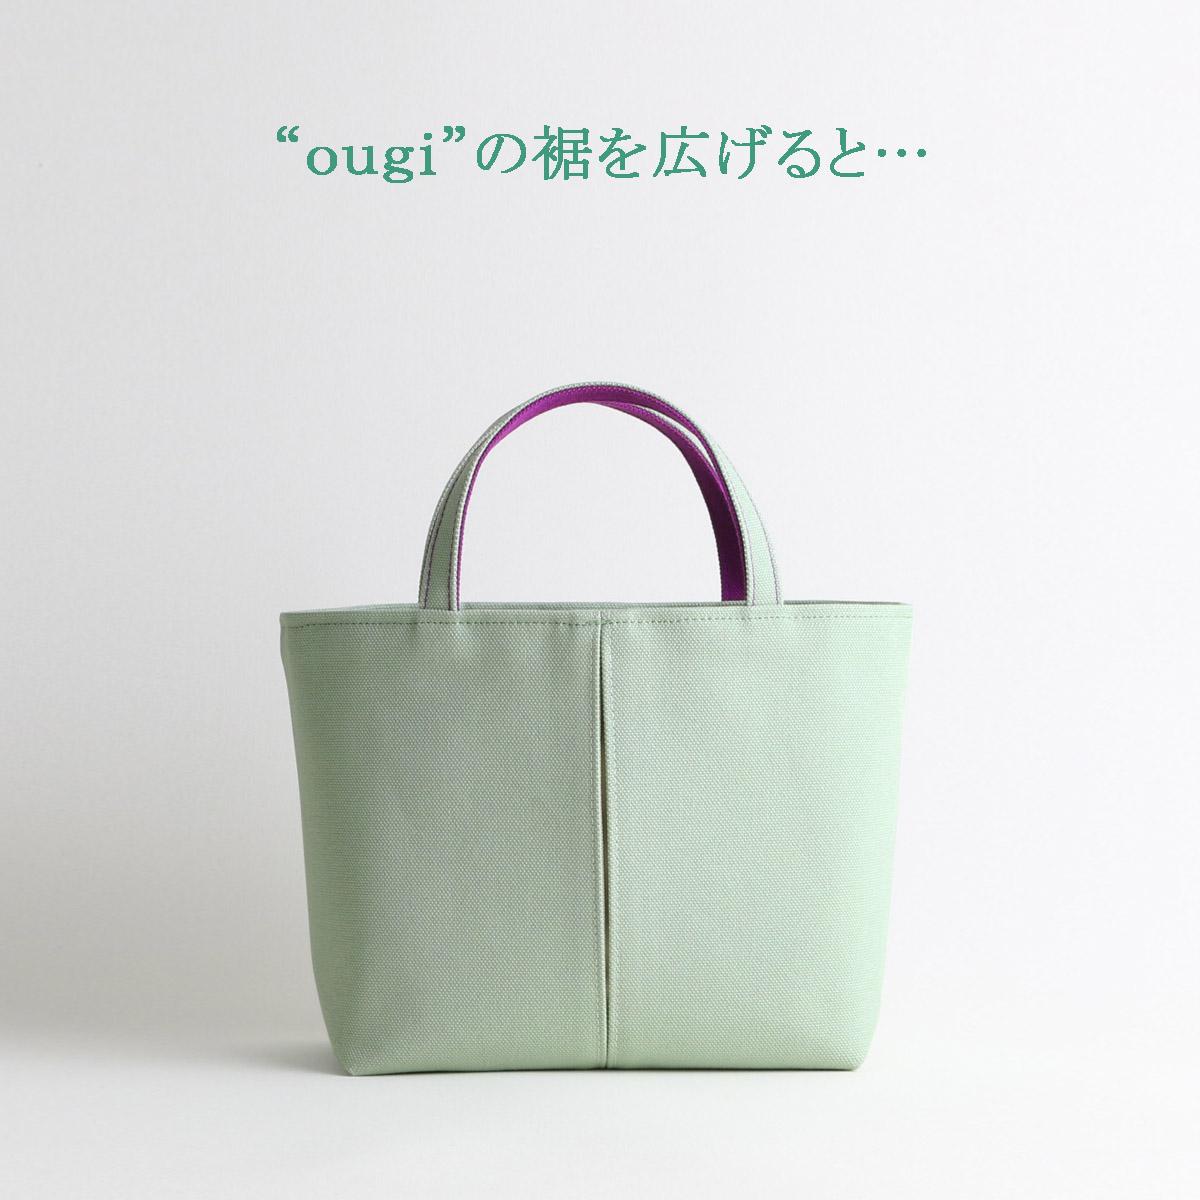 KOSHO ougi pleats 帆布 トートバッグ YS